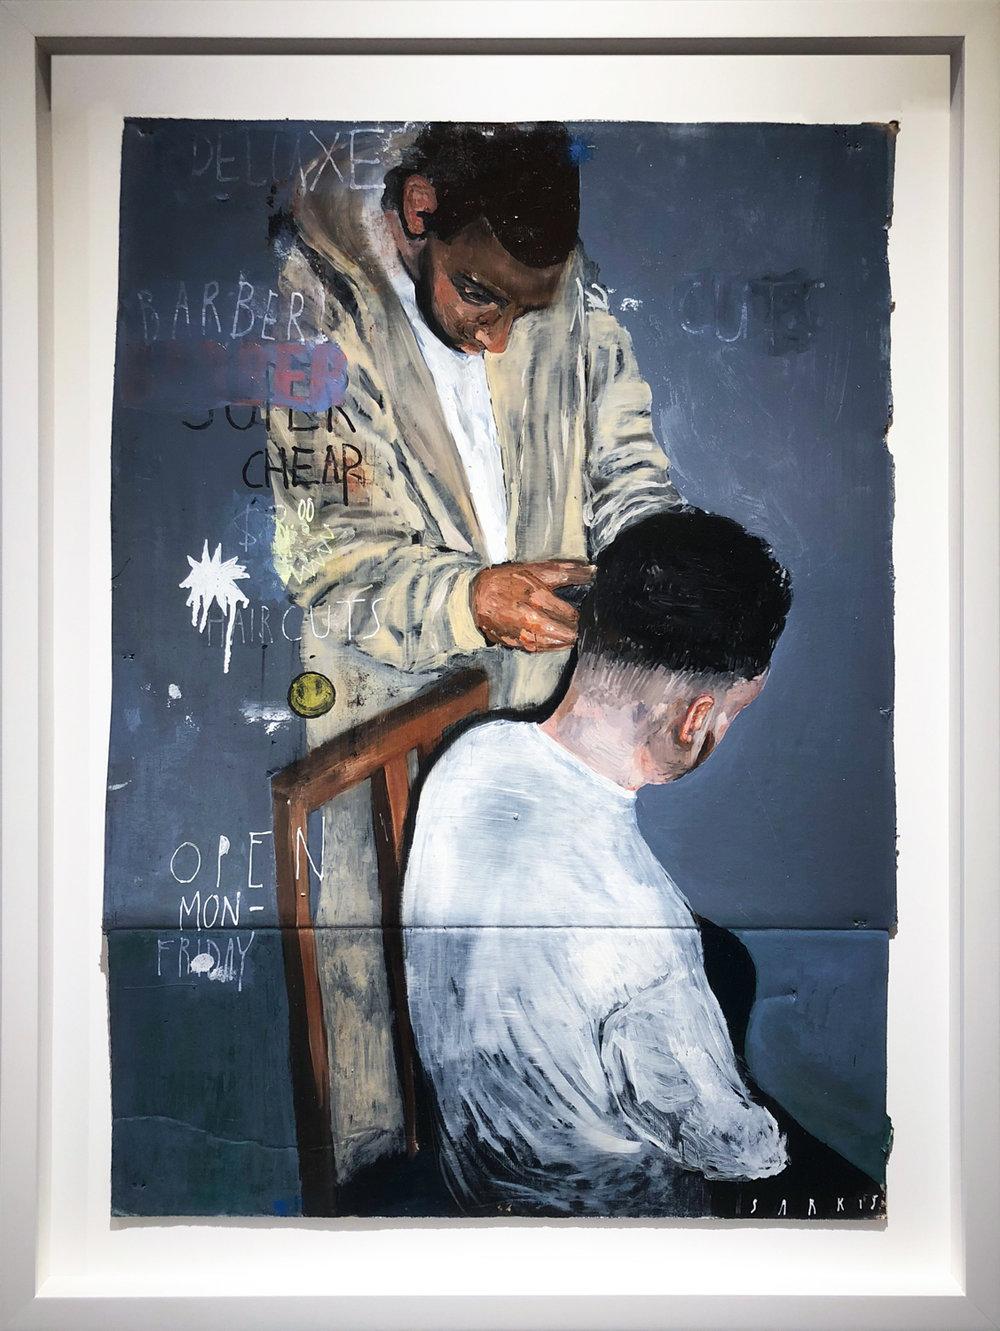 John Sarkis - Backyard Haircuts